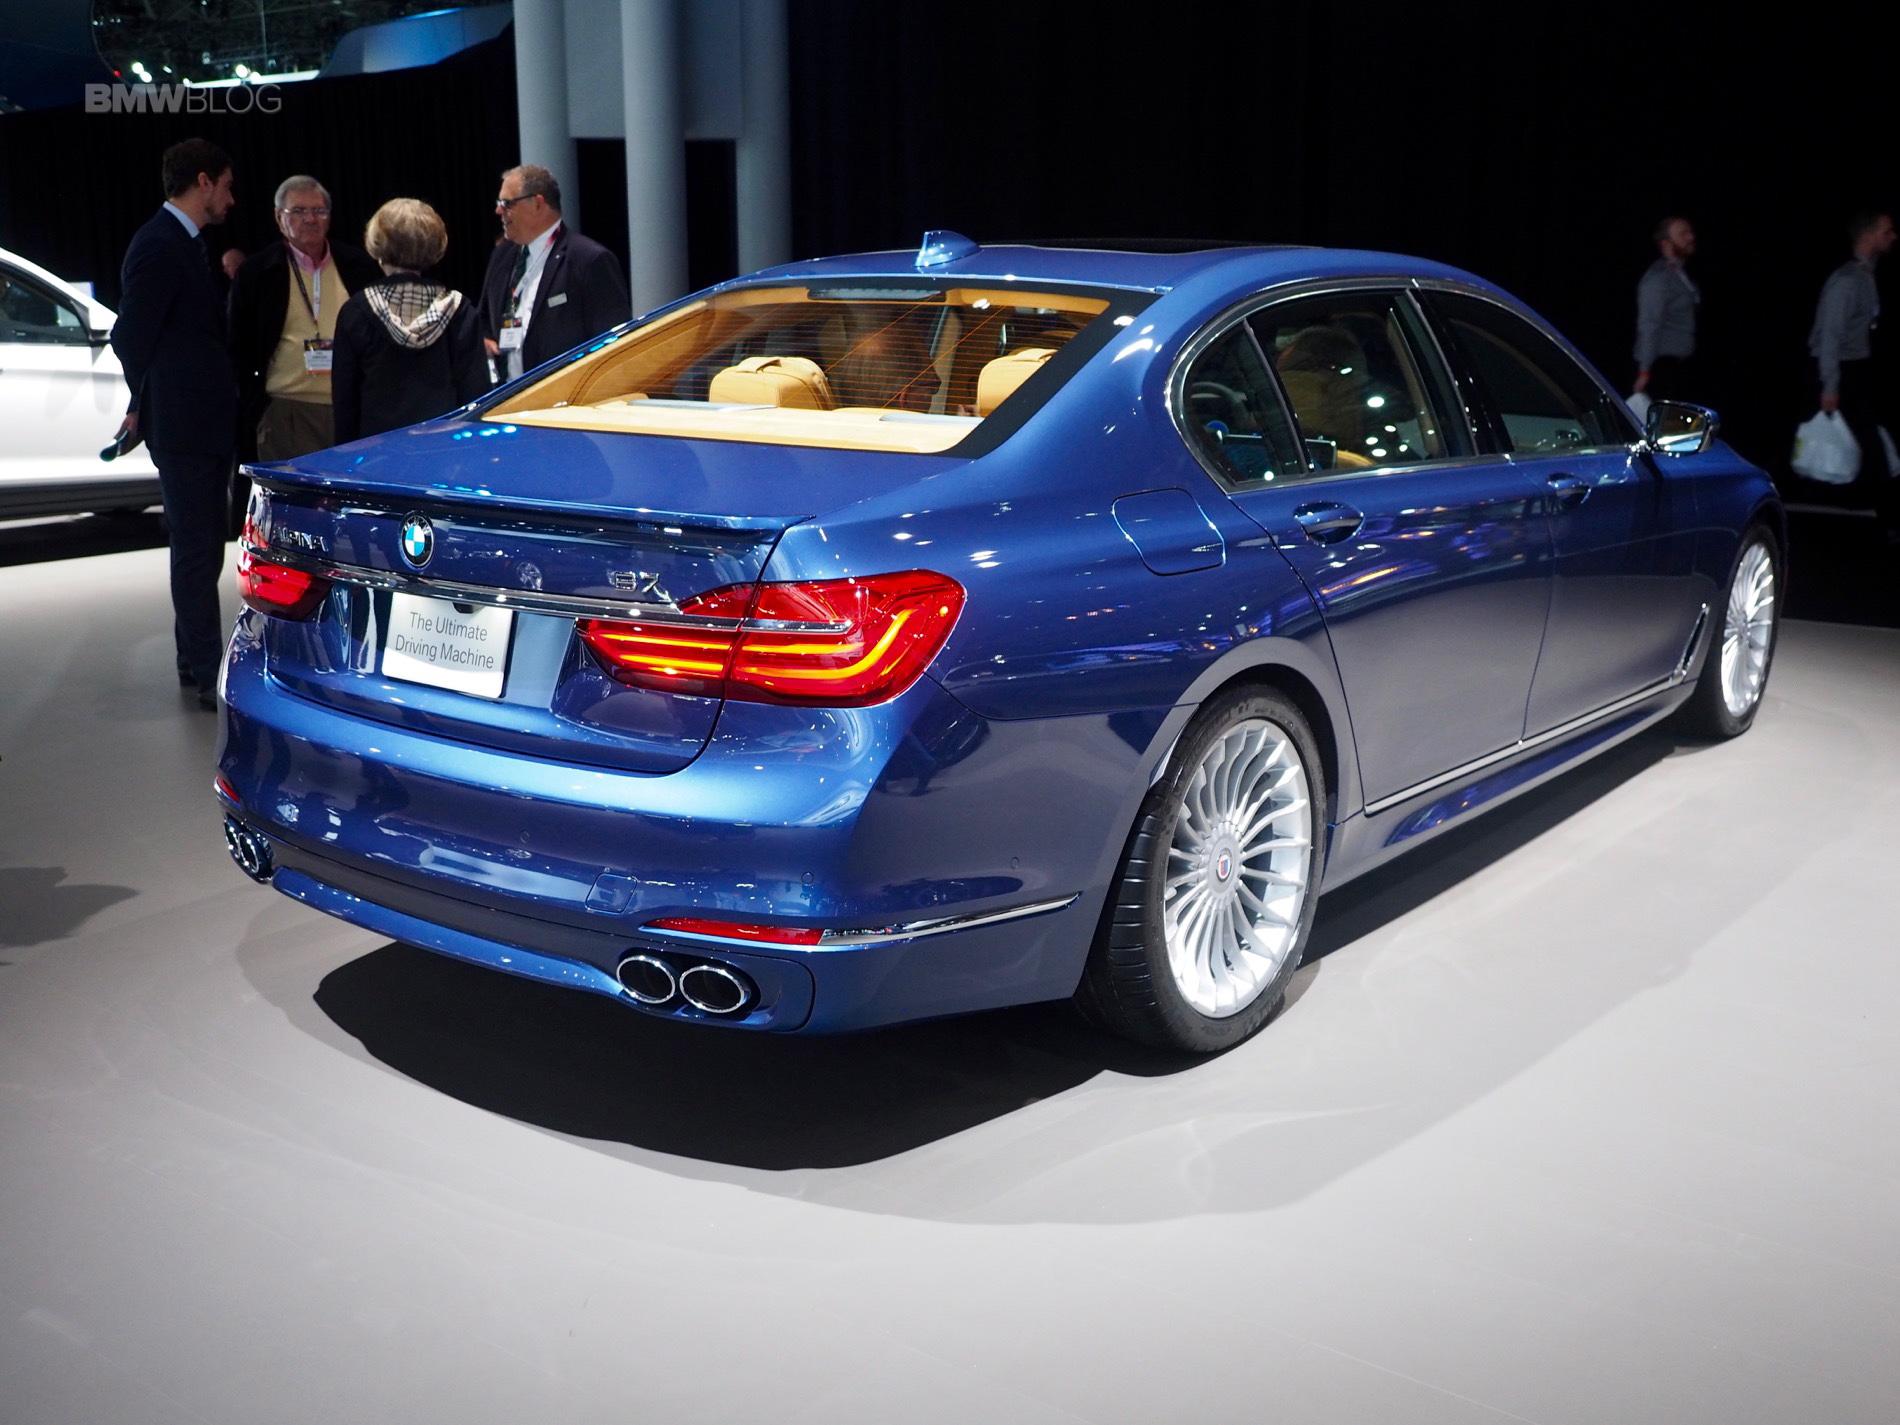 2016 New York Auto Show: BMW ALPINA B7 makes U.S. debut